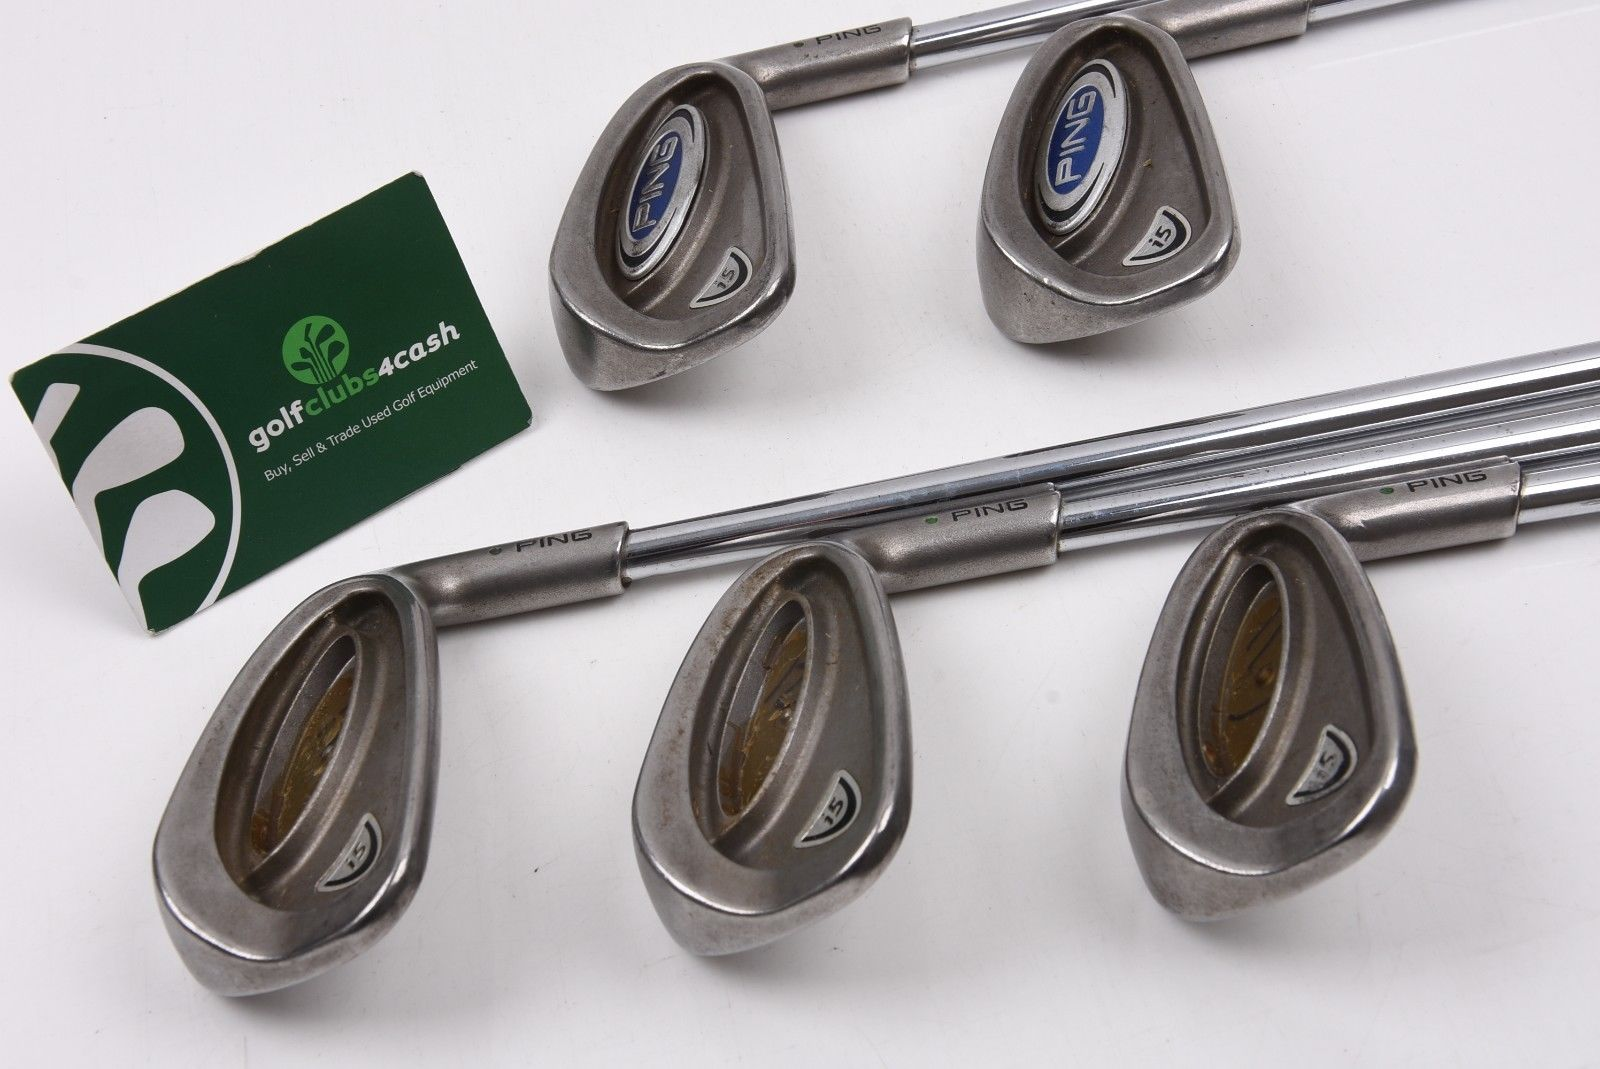 PING i5 IRONS / 6-PW / REGULAR STEEL SHAFTS / GREEN DOT / PIII54001